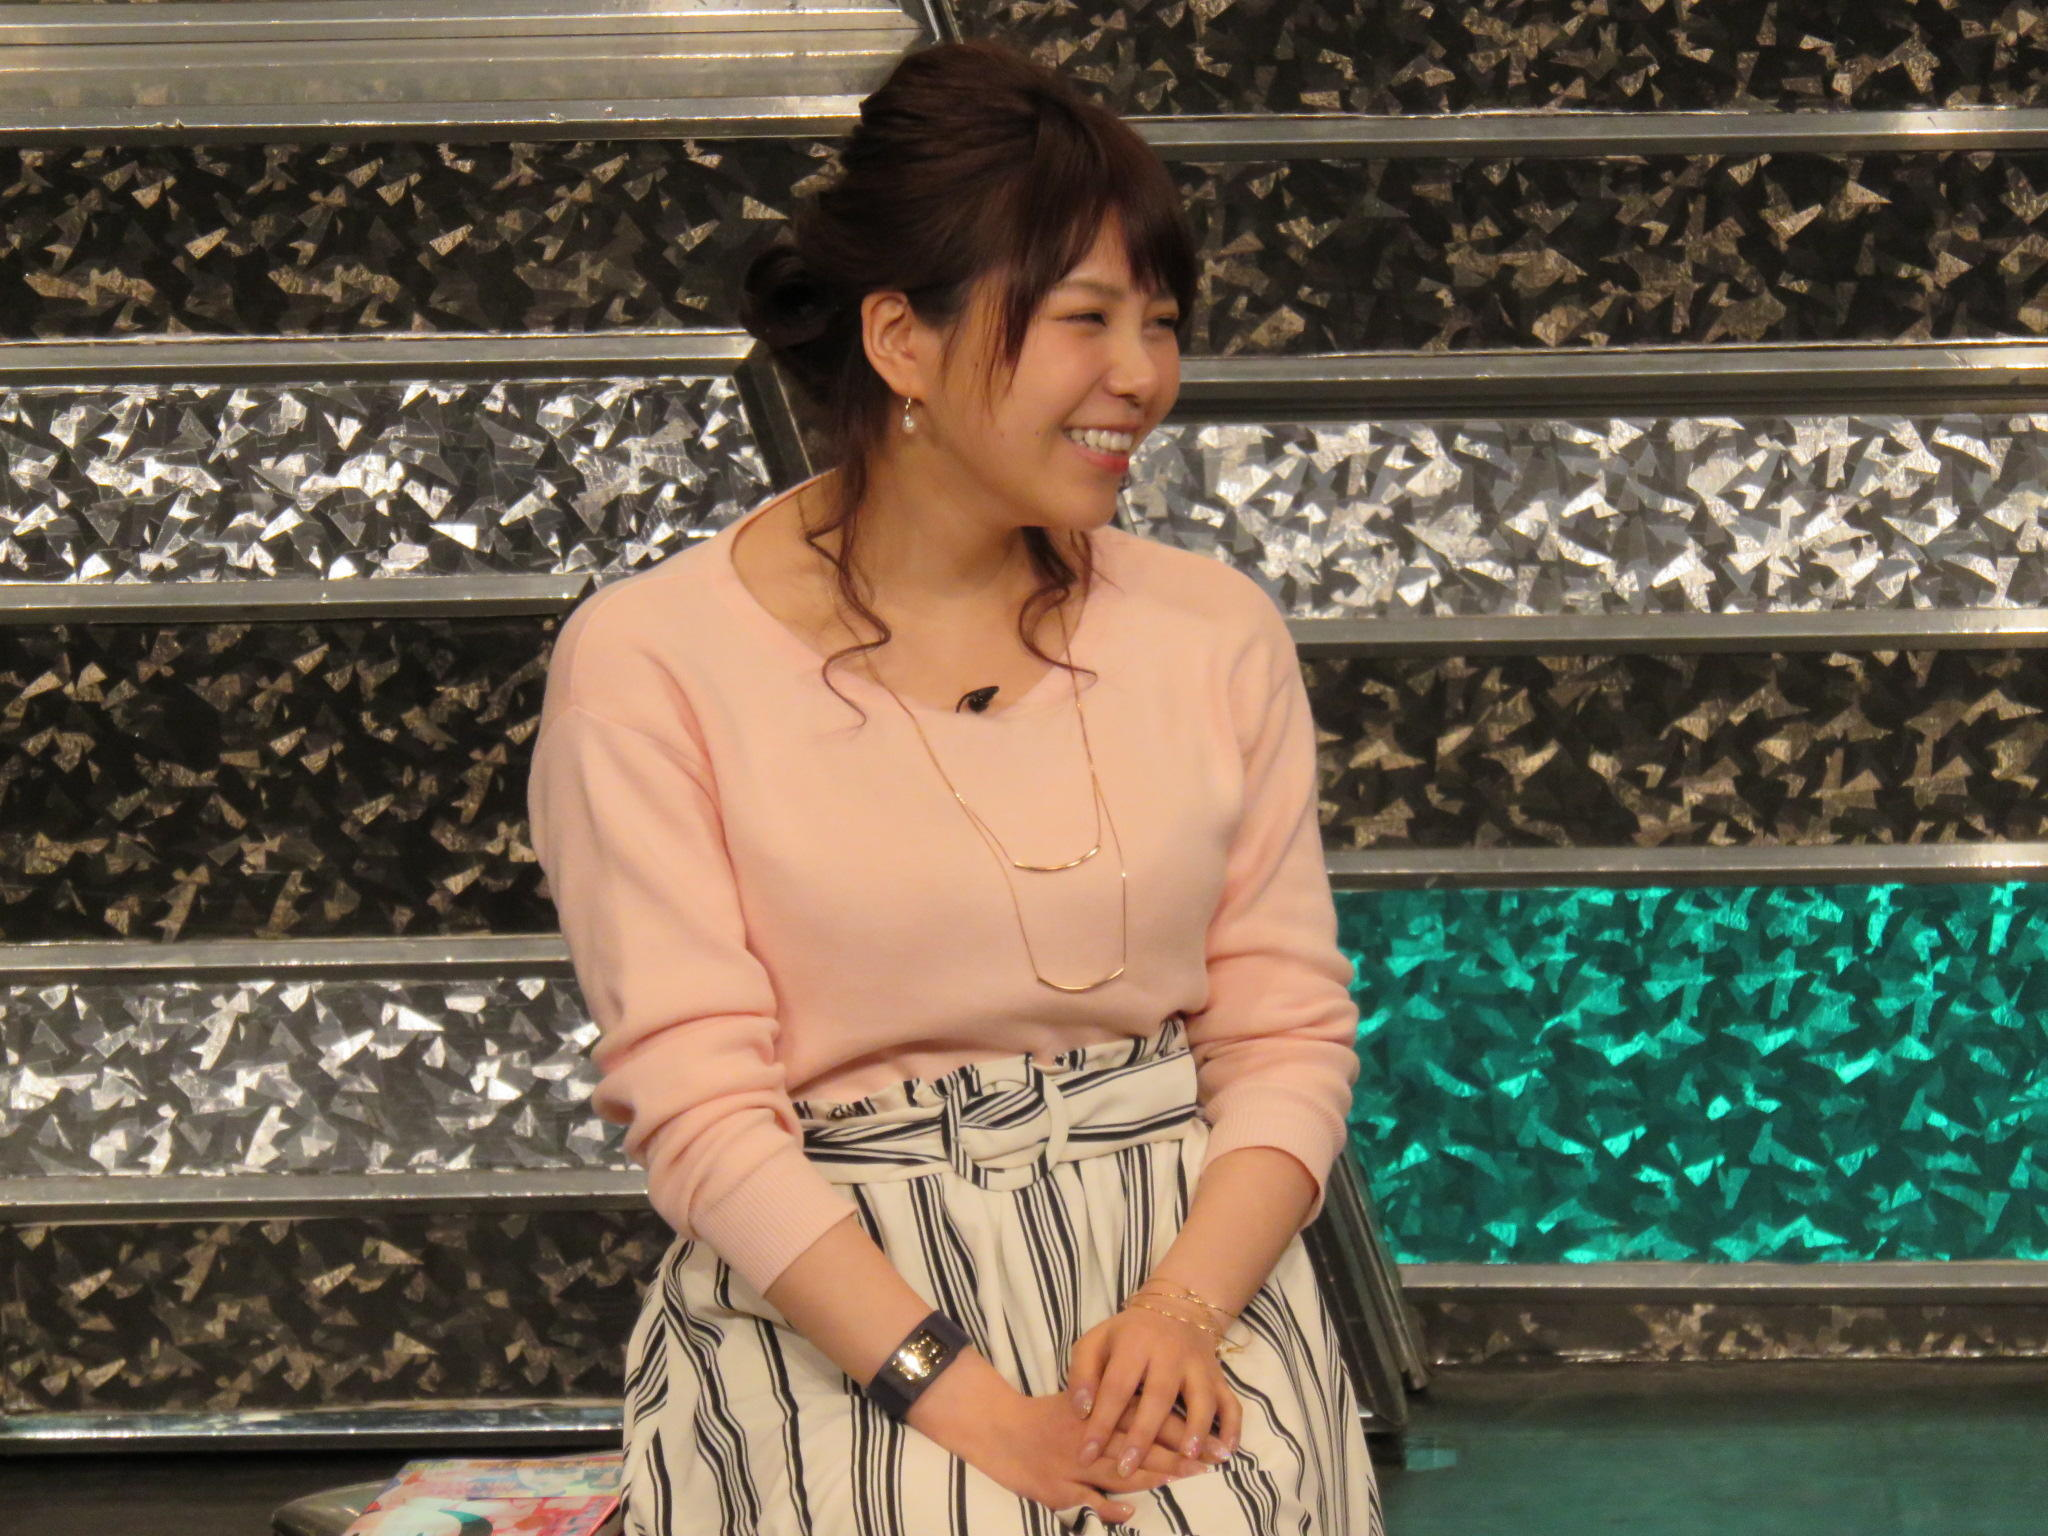 http://news.yoshimoto.co.jp/20170331201016-d7b3ef8a2c6236a8df74e7e8010e2a06615474f7.jpg